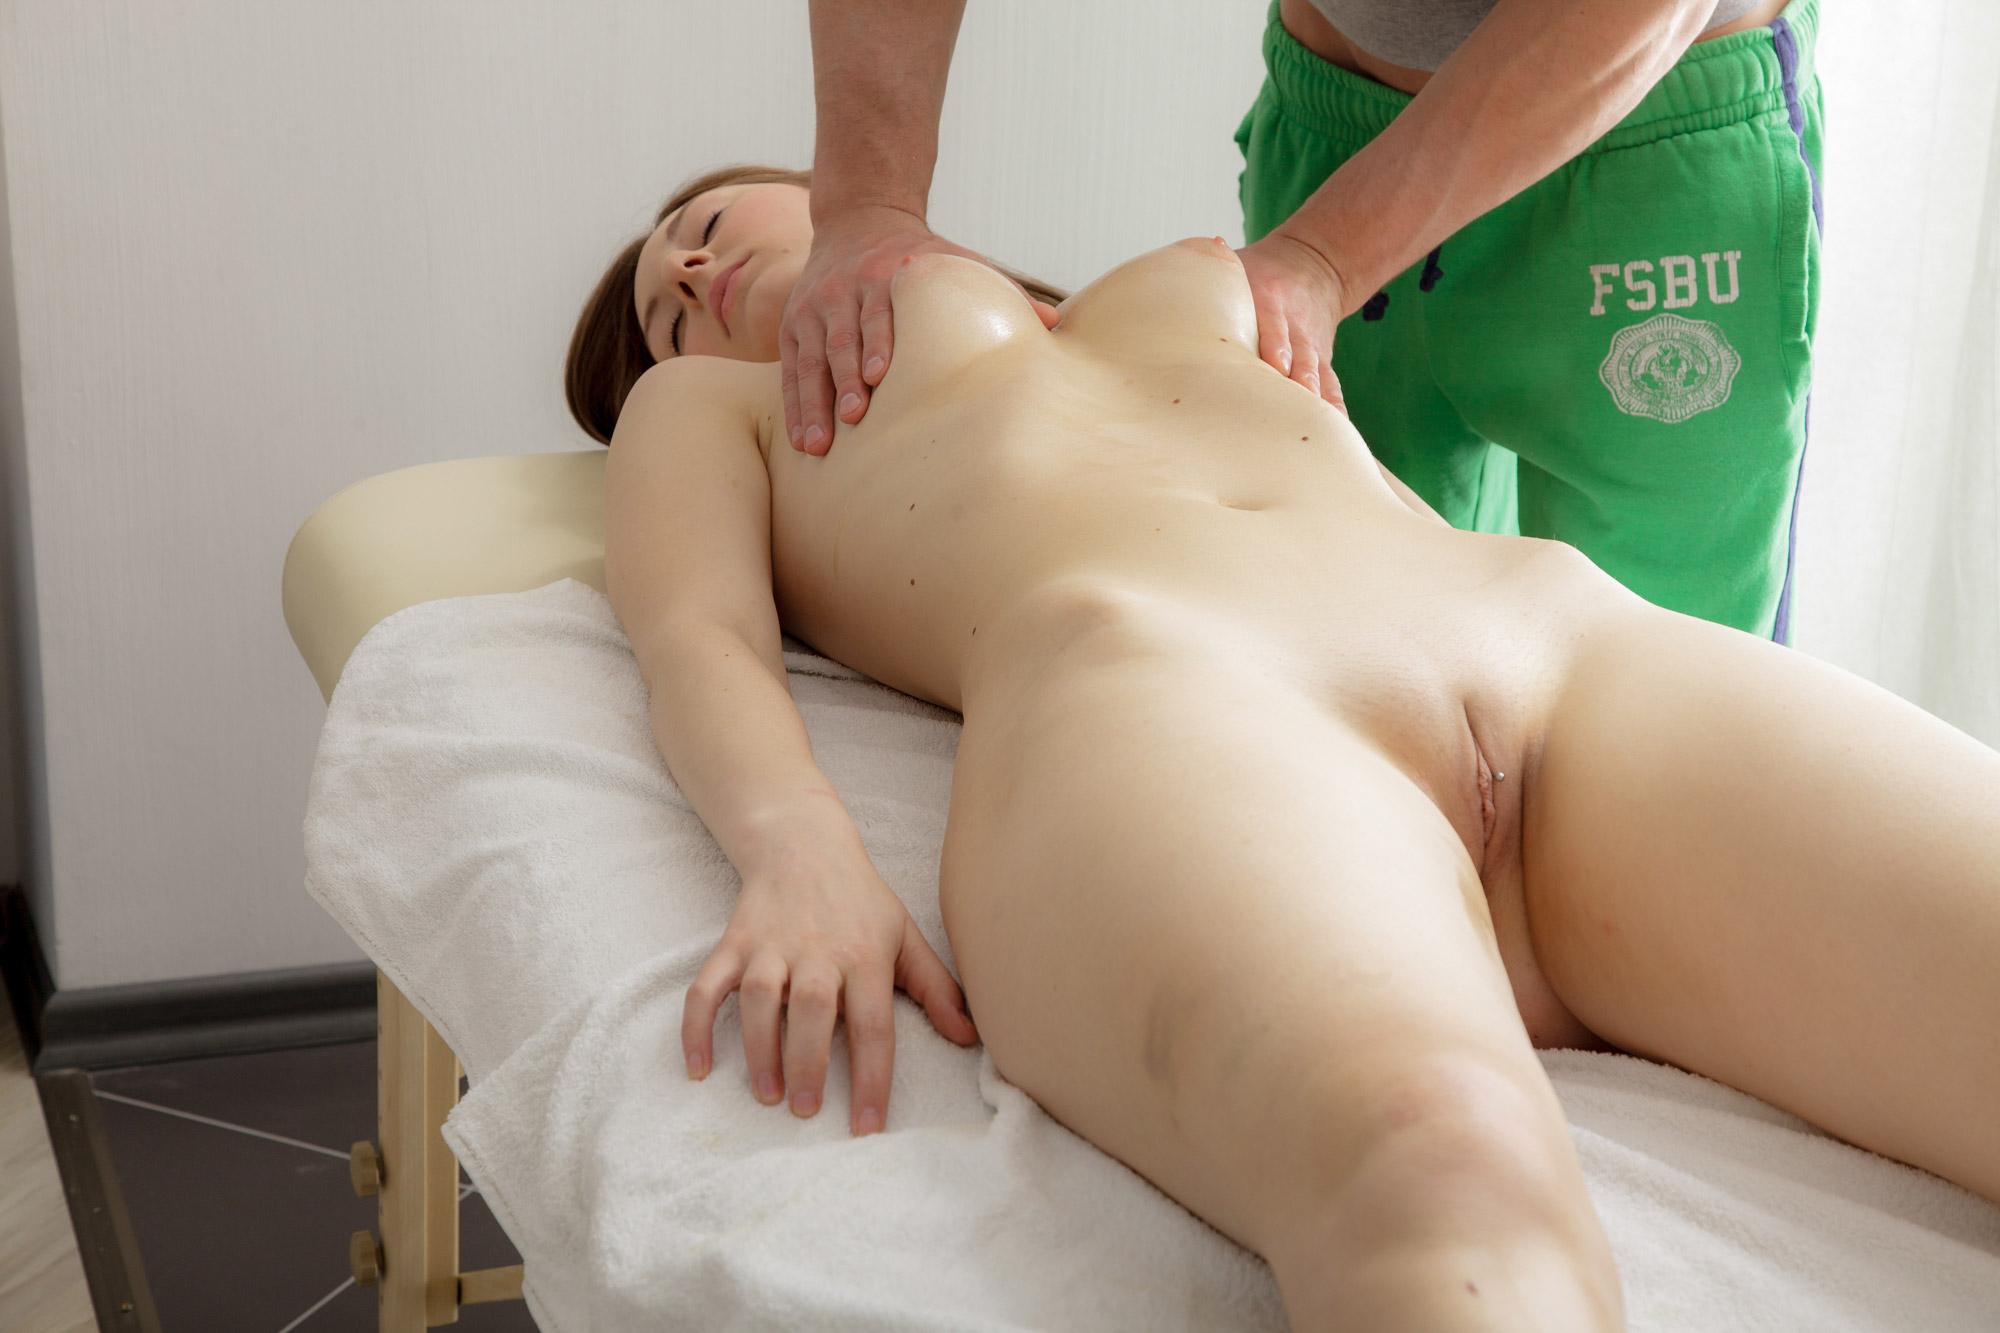 Massage therapist seduces hot girl